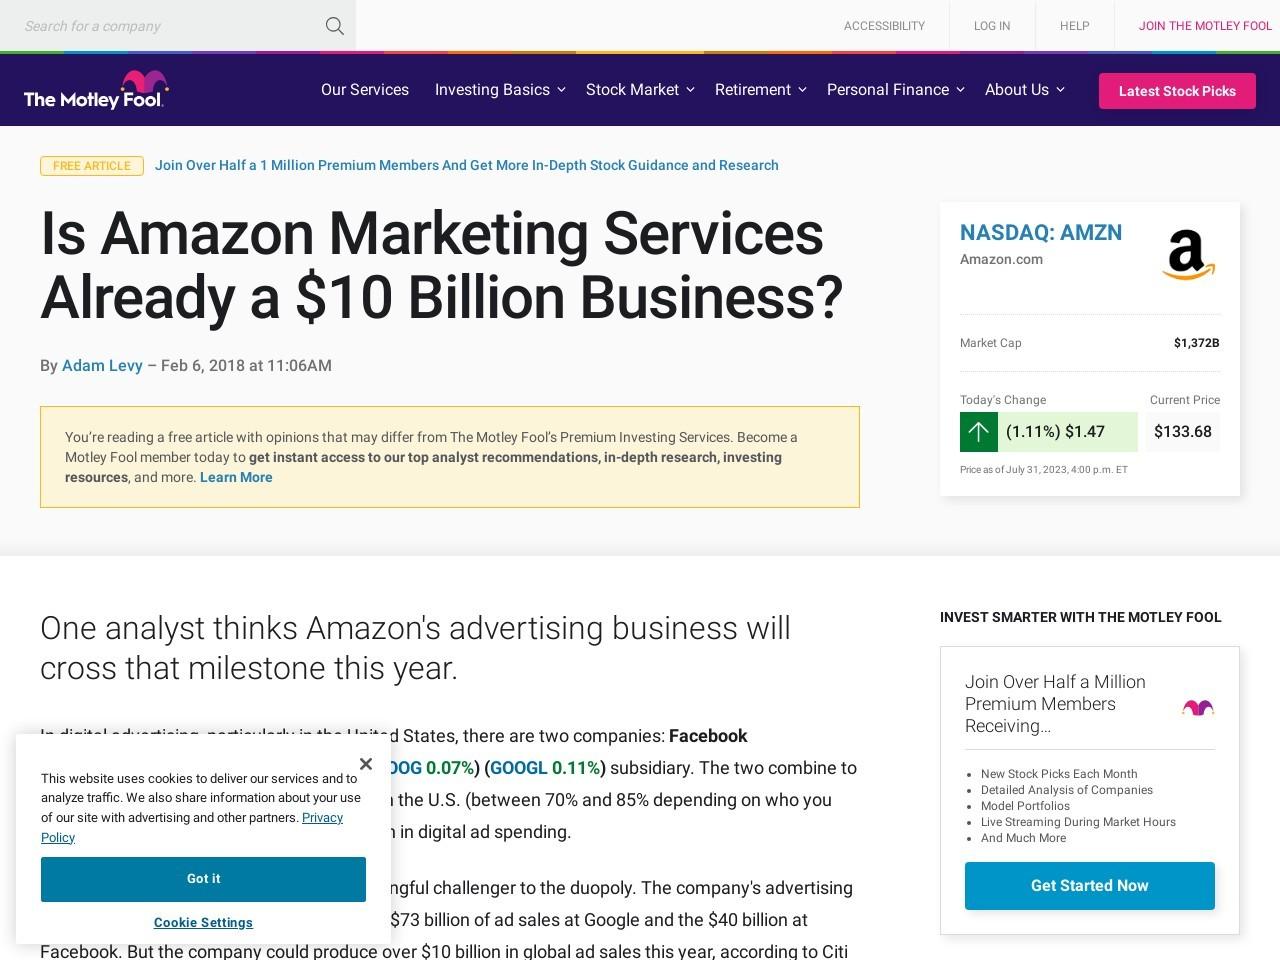 Is Amazon Marketing Services Already a $10 Billion Business?